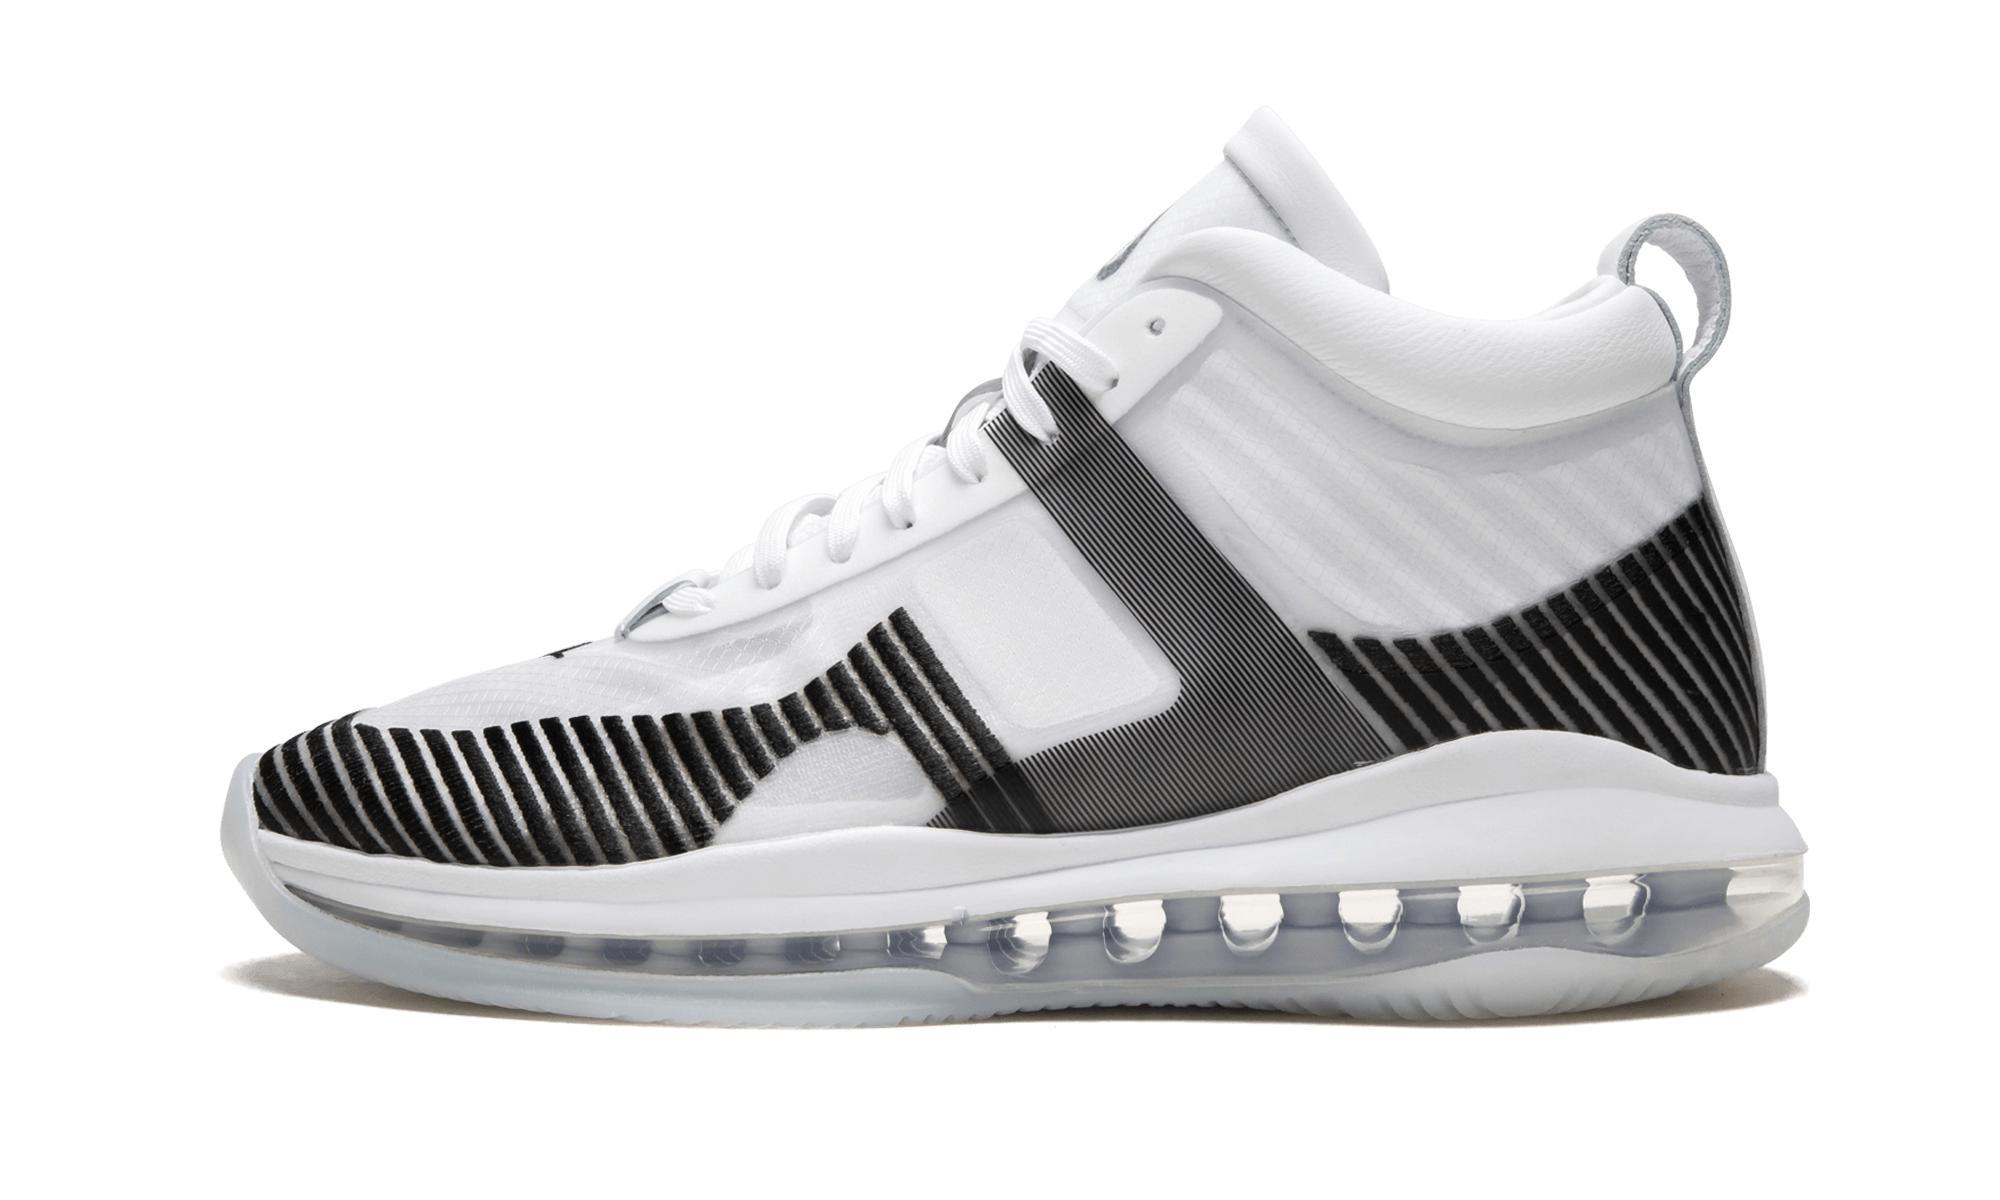 best authentic 77610 4812b Nike LeBron Ambassador 10 White Midnight Navy-Metallic Gold AH7580-100 Nike.